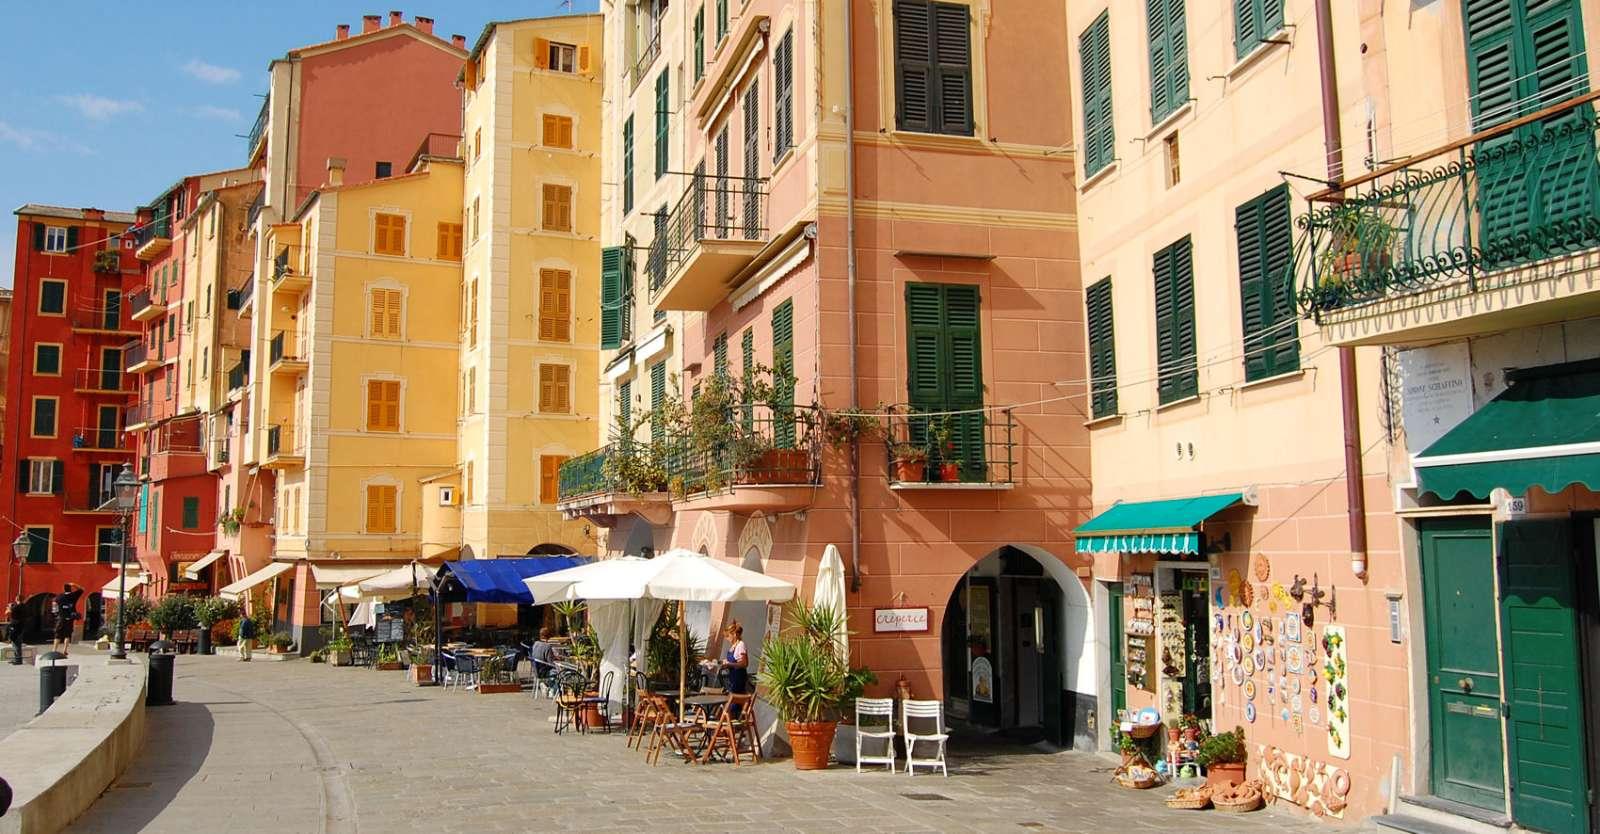 I Ligurien spænder pastelfarverne bredt - her i Camogli ved Portofino